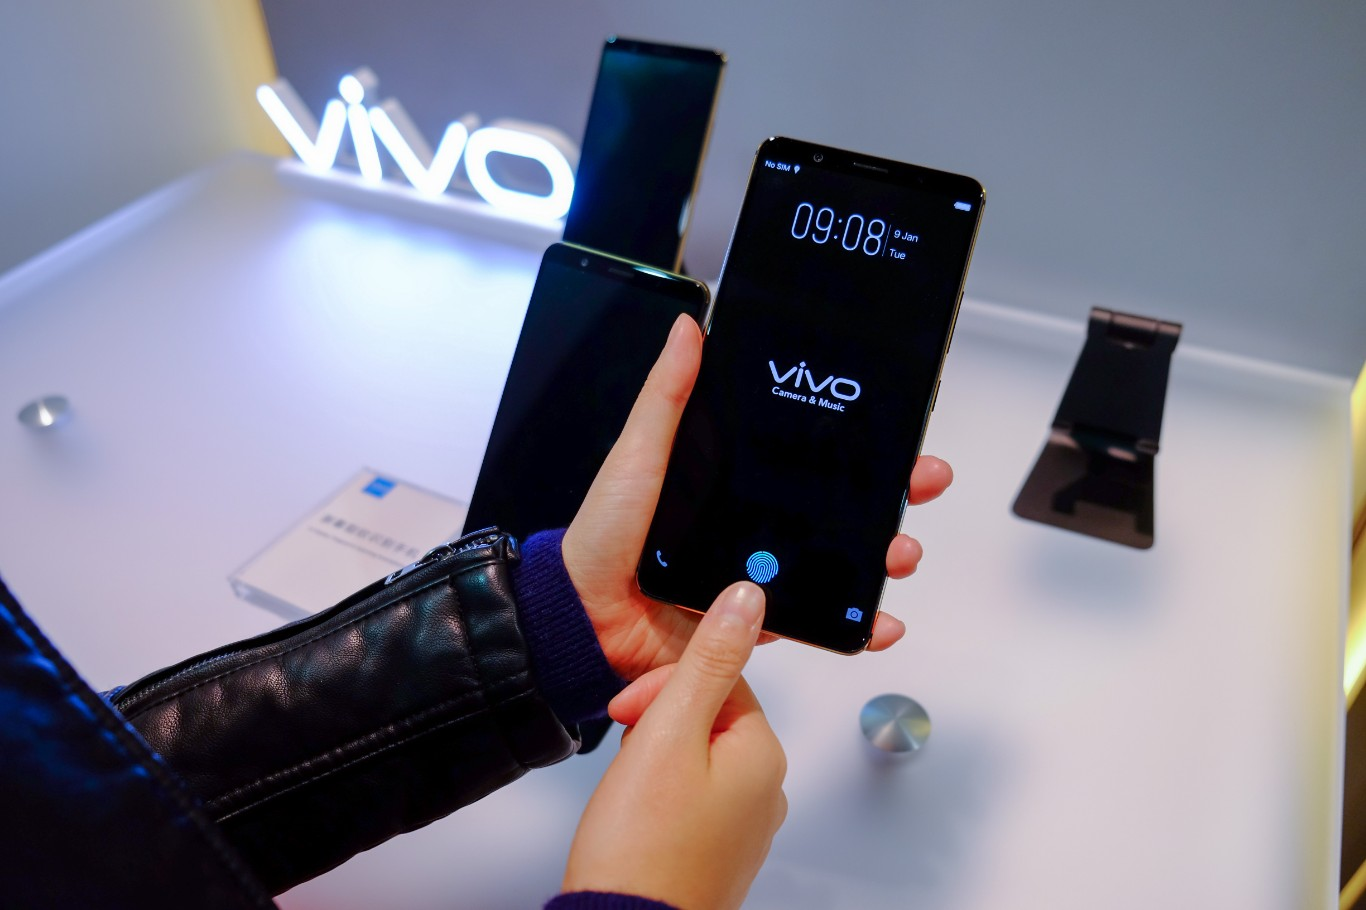 VIDEO - Here is the in-screen fingerprint scanner in action 1